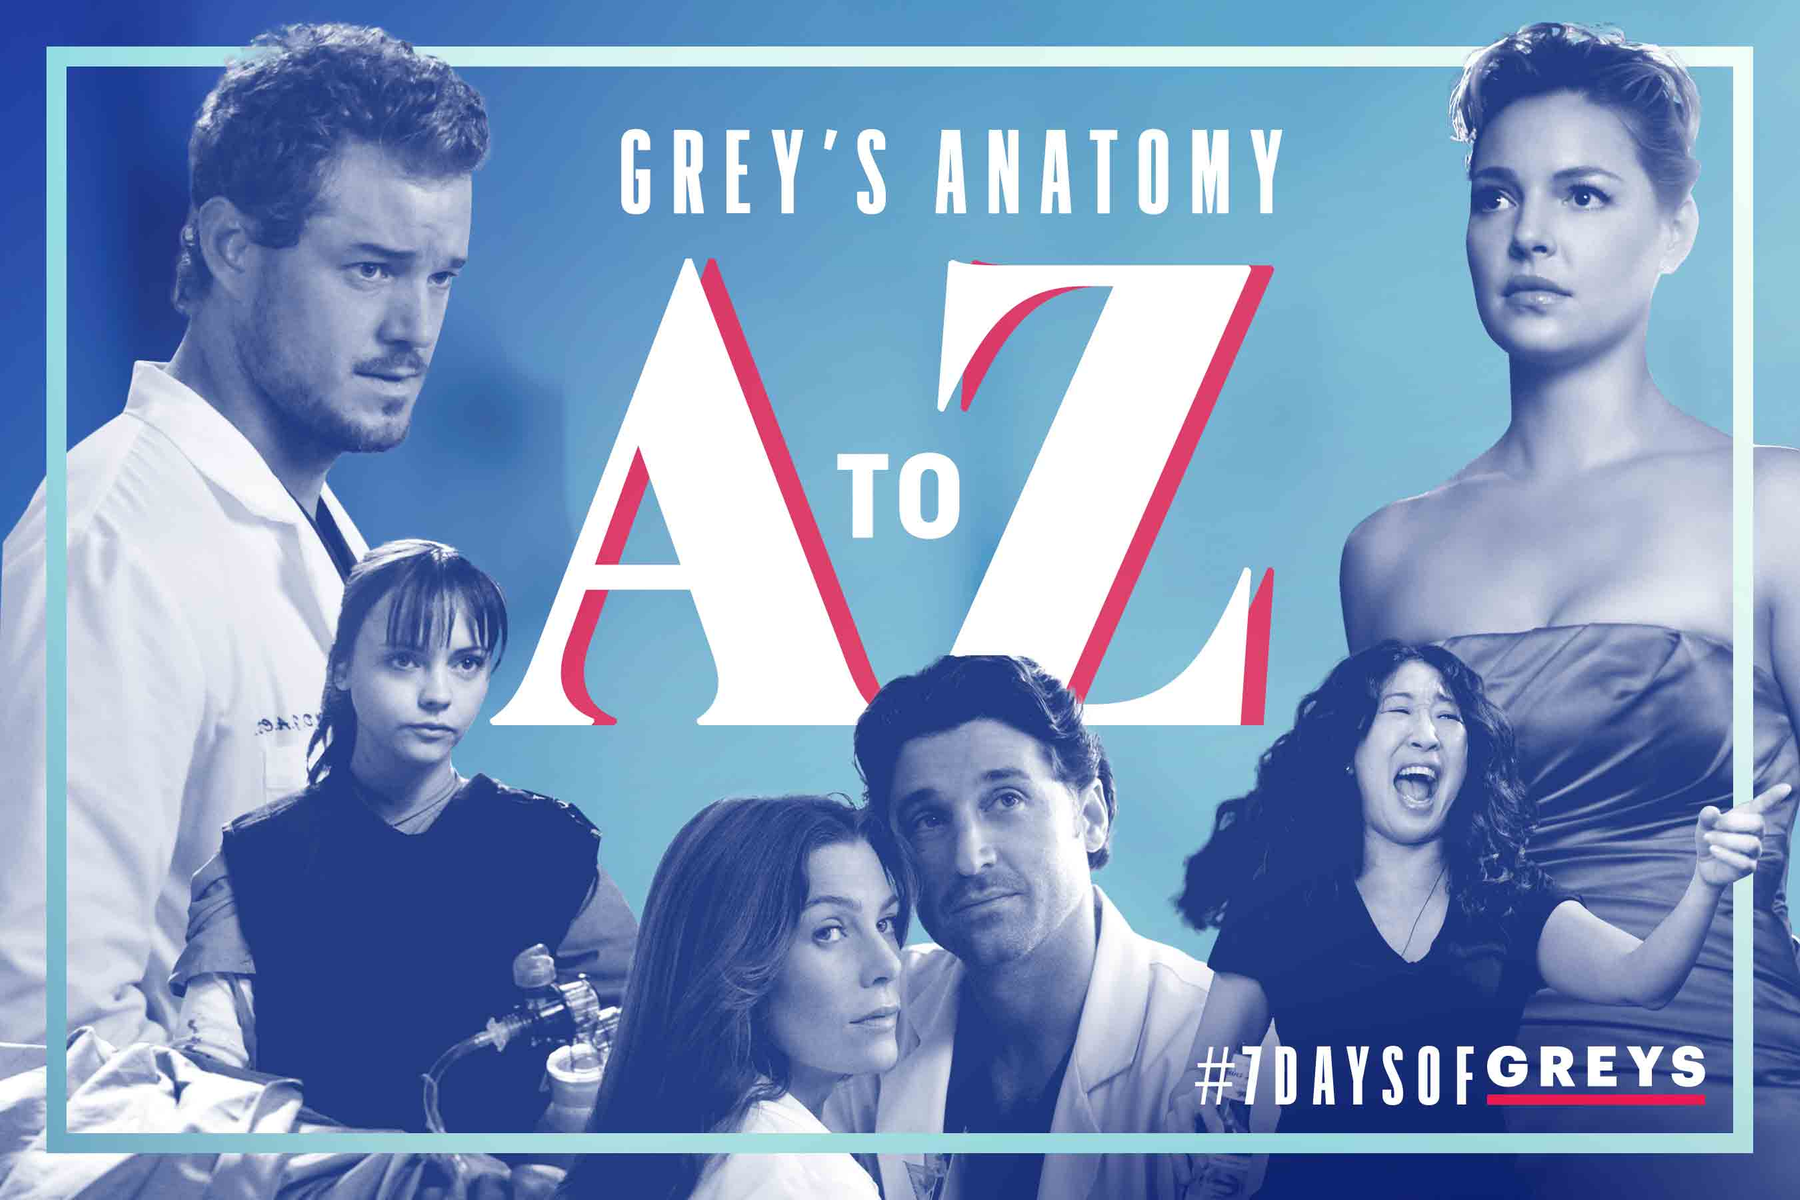 Greys A to Z tout